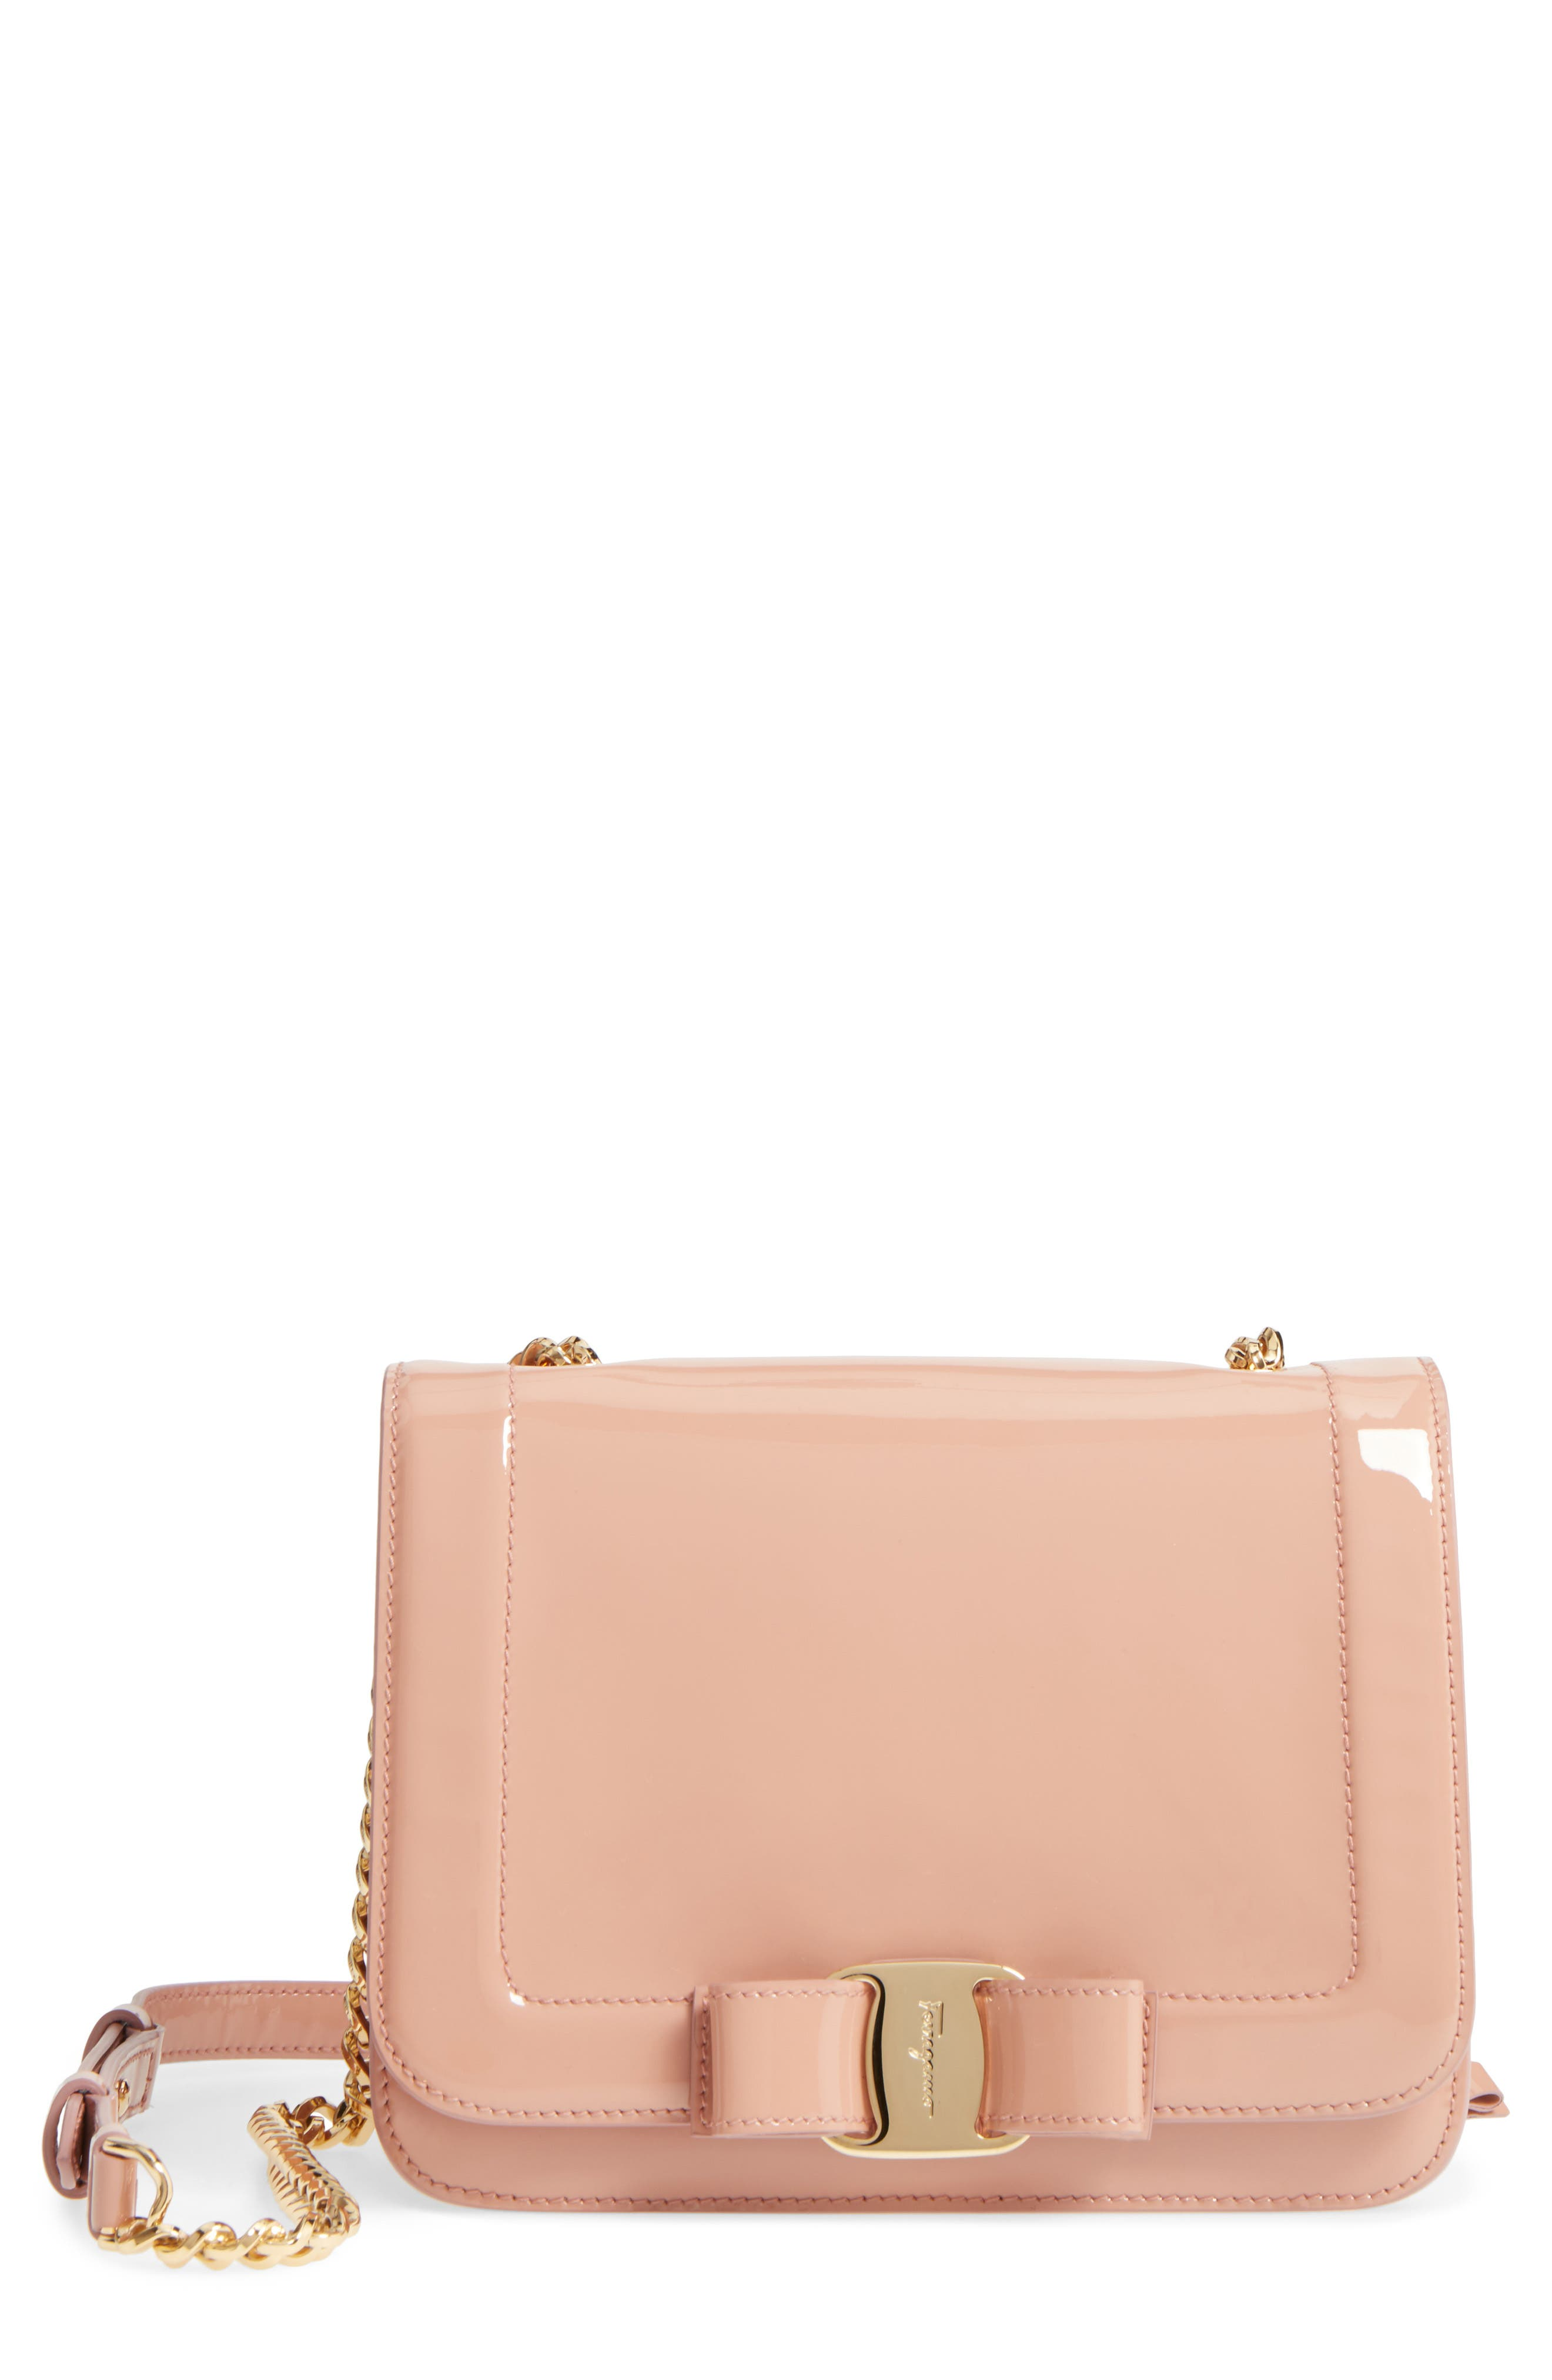 Vara Patent Leather Shoulder Bag,                         Main,                         color, New Blush/ Bonbon